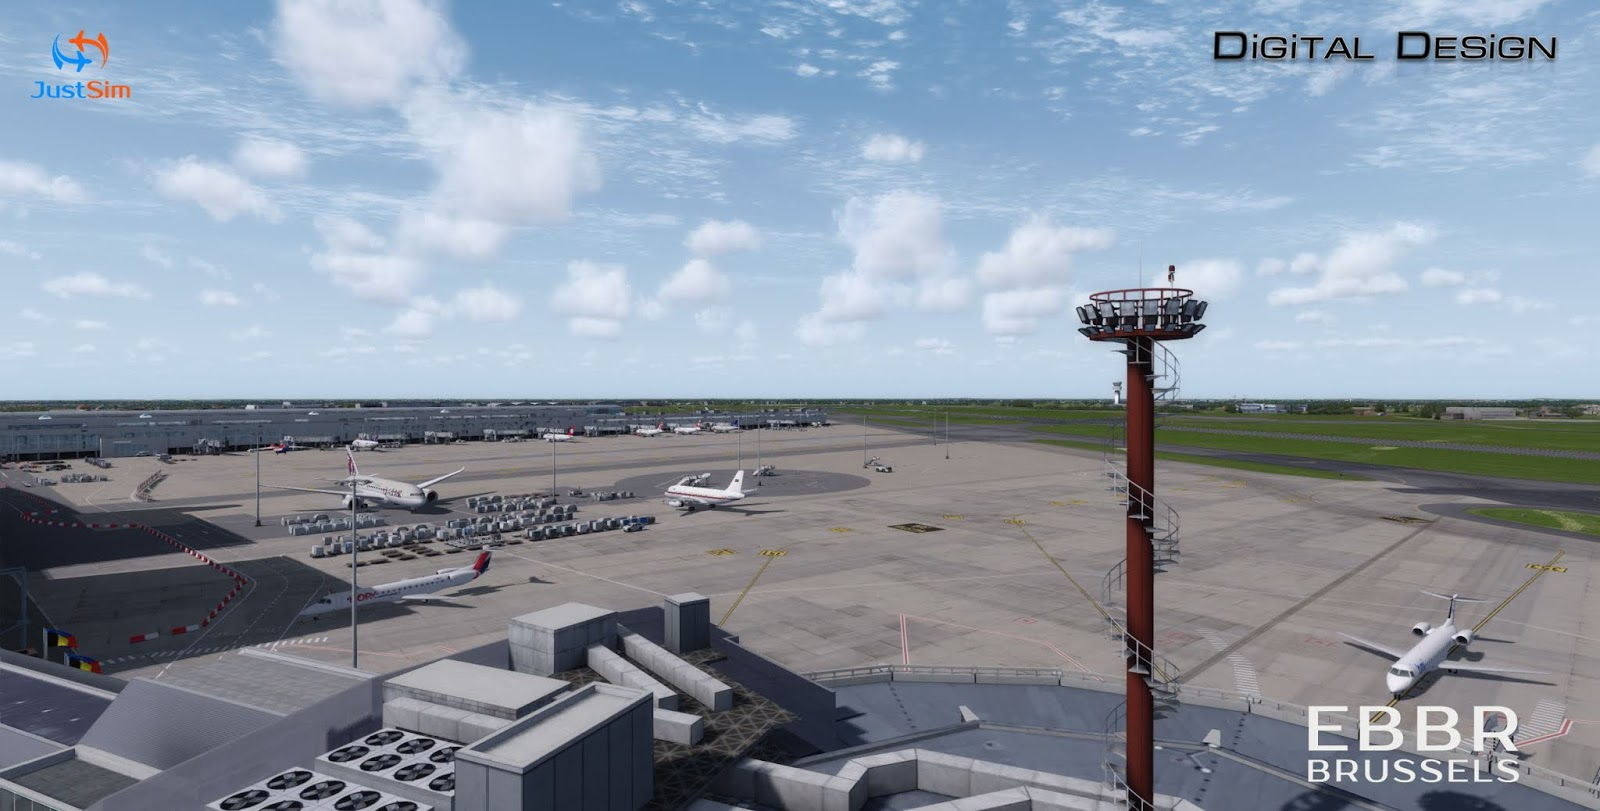 JustSim - Brussels International Airport (EBBR) New release for